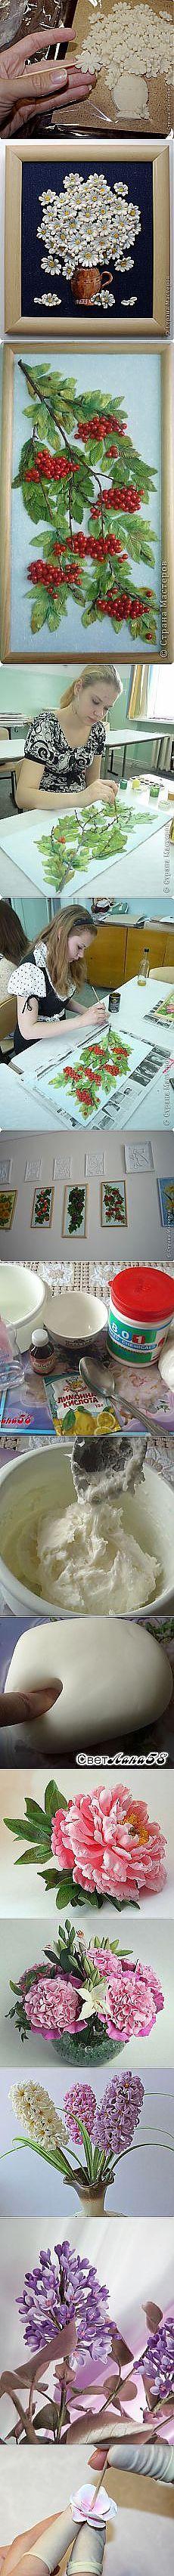 ХОЛОДНЫЙ ФАРФОР | Идеи и фотоинструкции бесплатно на Постиле Cold Porcelain Flowers, Porcelain Clay, White Porcelain, Stencils, Play Clay, Cricut Cards, Clay Flowers, Salt Dough, Air Dry Clay